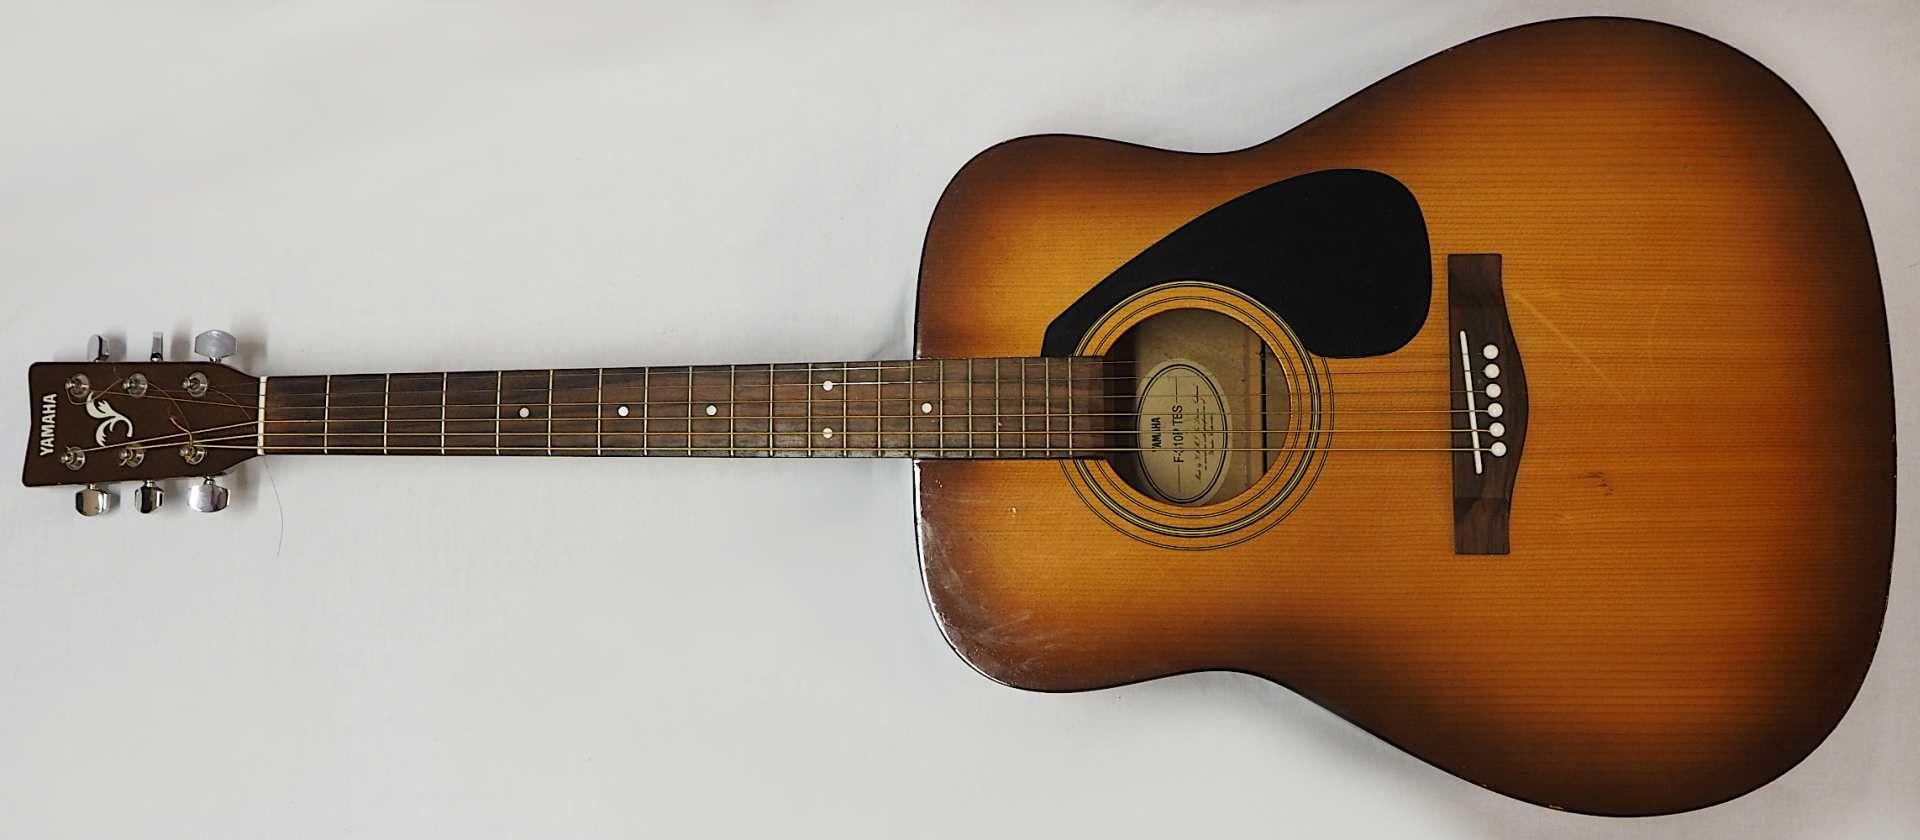 "1 Westerngitarre YAMAHA Modell: ""F-310P TBS, YMMJ Co. Ldt.,"" Indonesien Holzkorpus mit - Bild 2 aus 6"